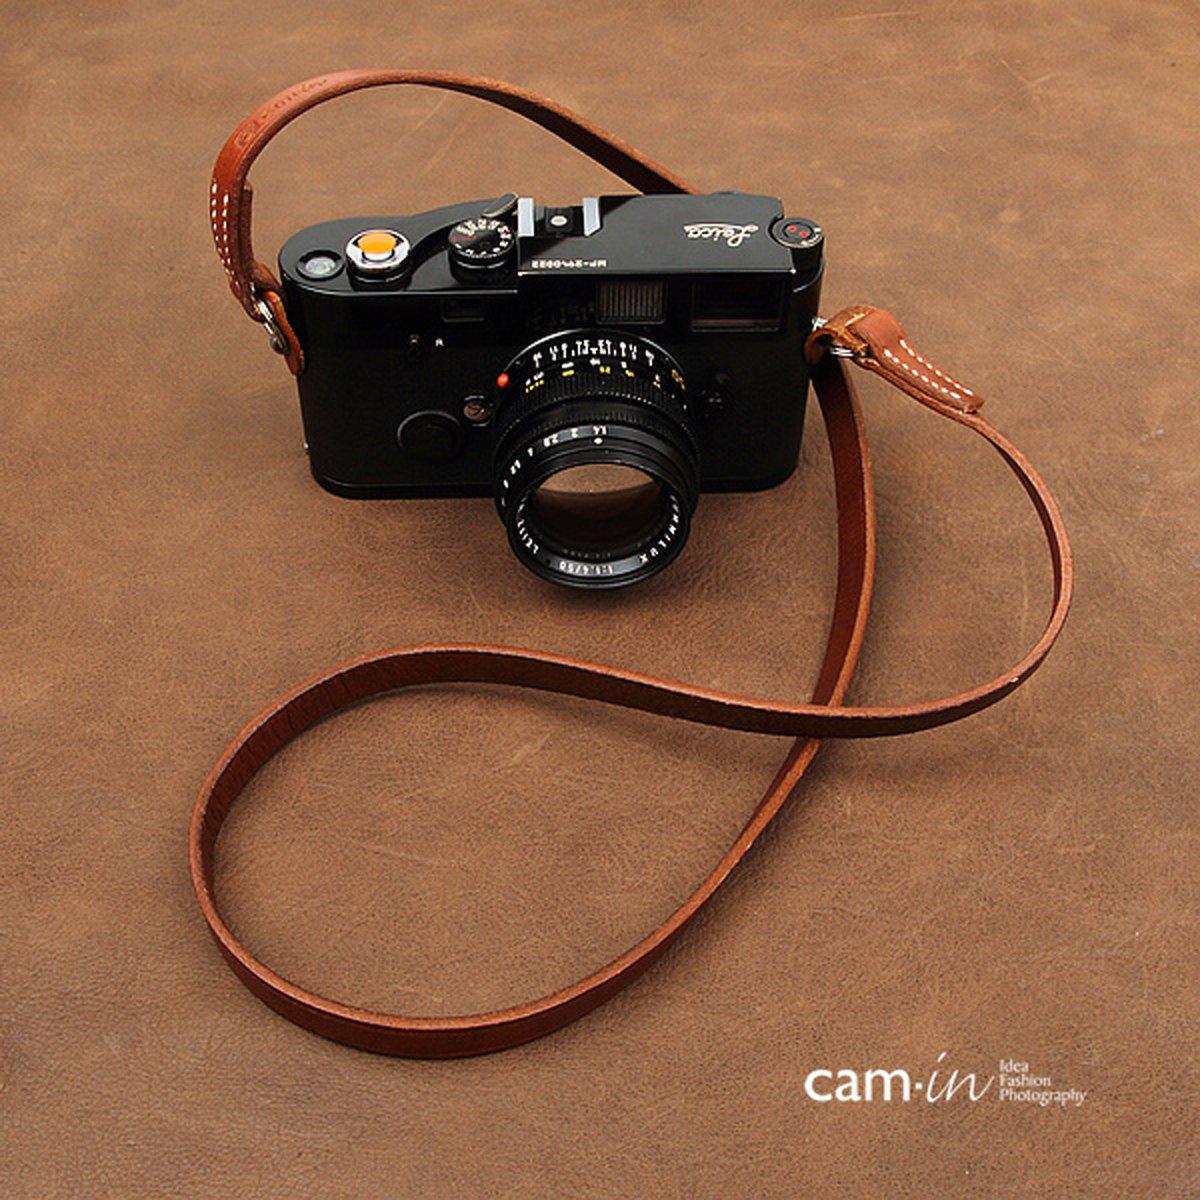 cam-in Realレザーショルダーネックカメラストラップfor Leica/Nikon / Sony/Fujifilmブラウン色 – cs214 B07FDFM8ZZ